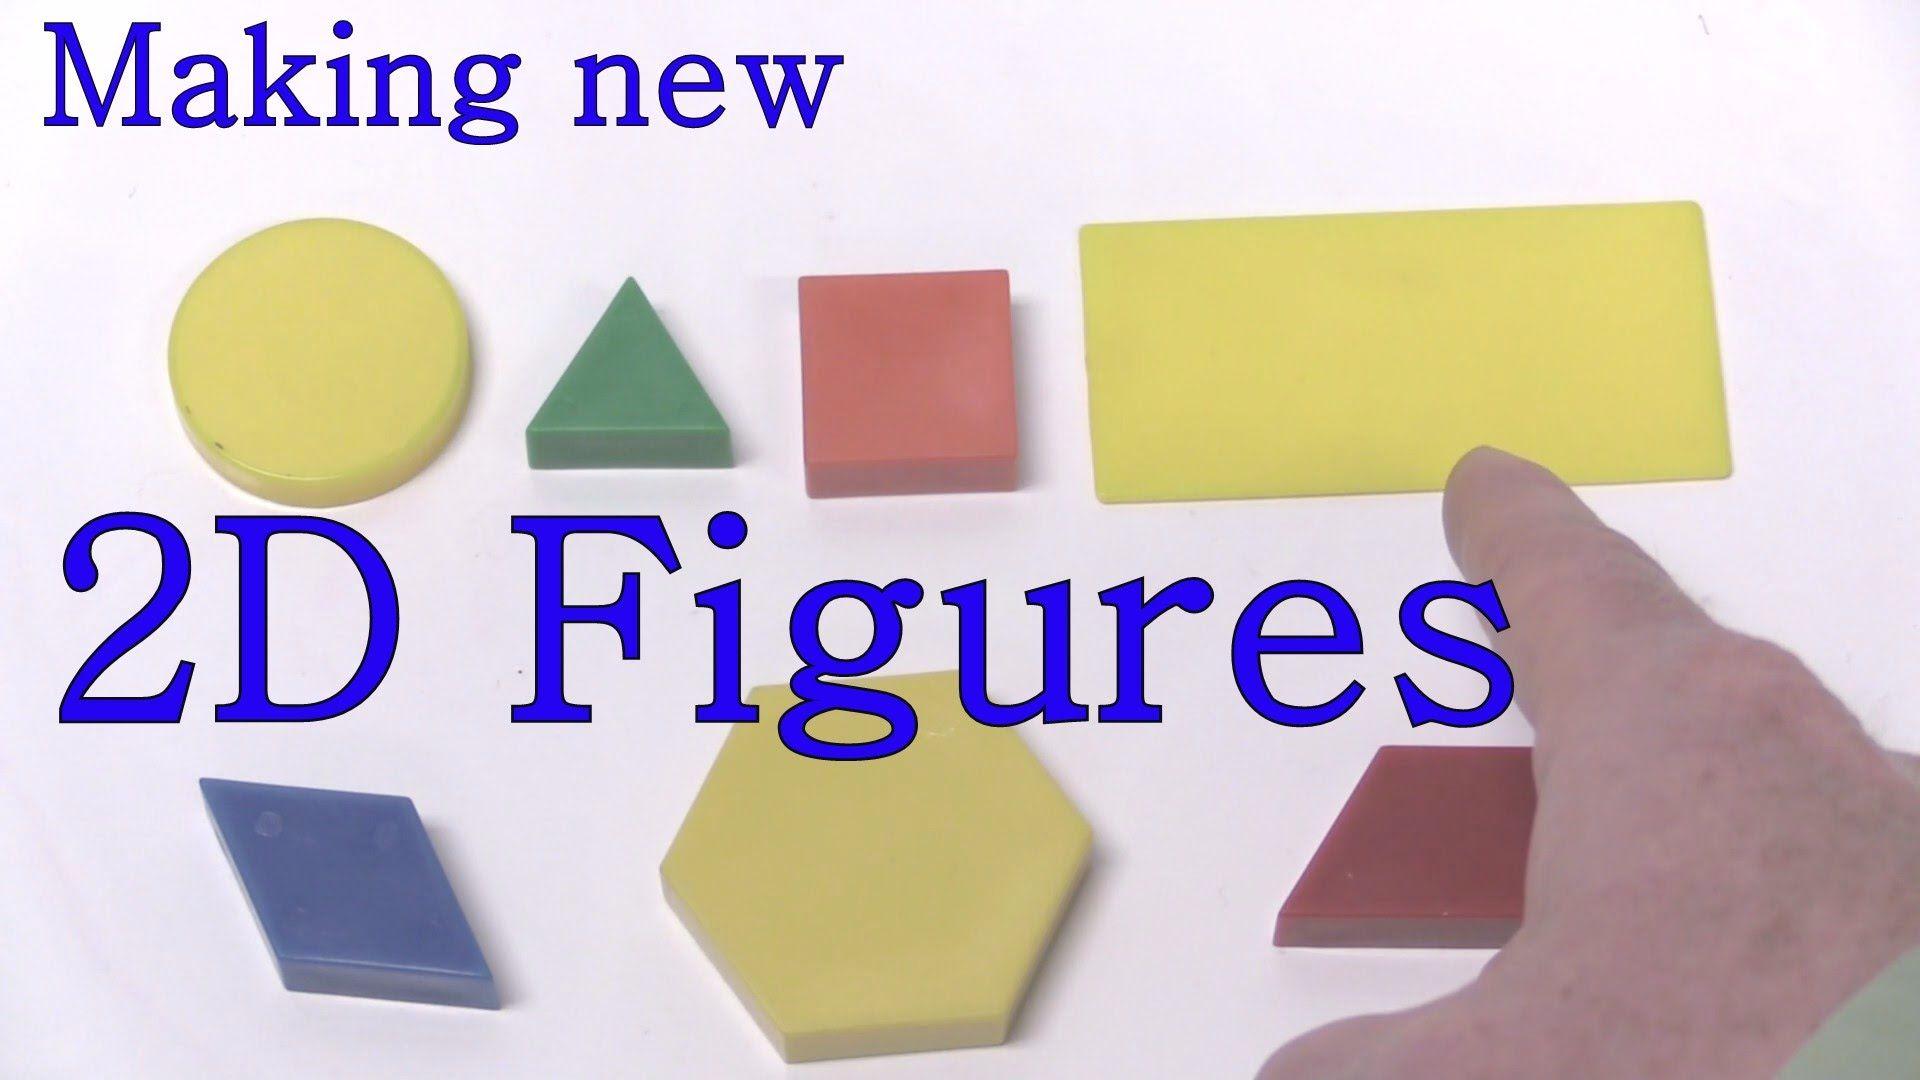 Make New Figures